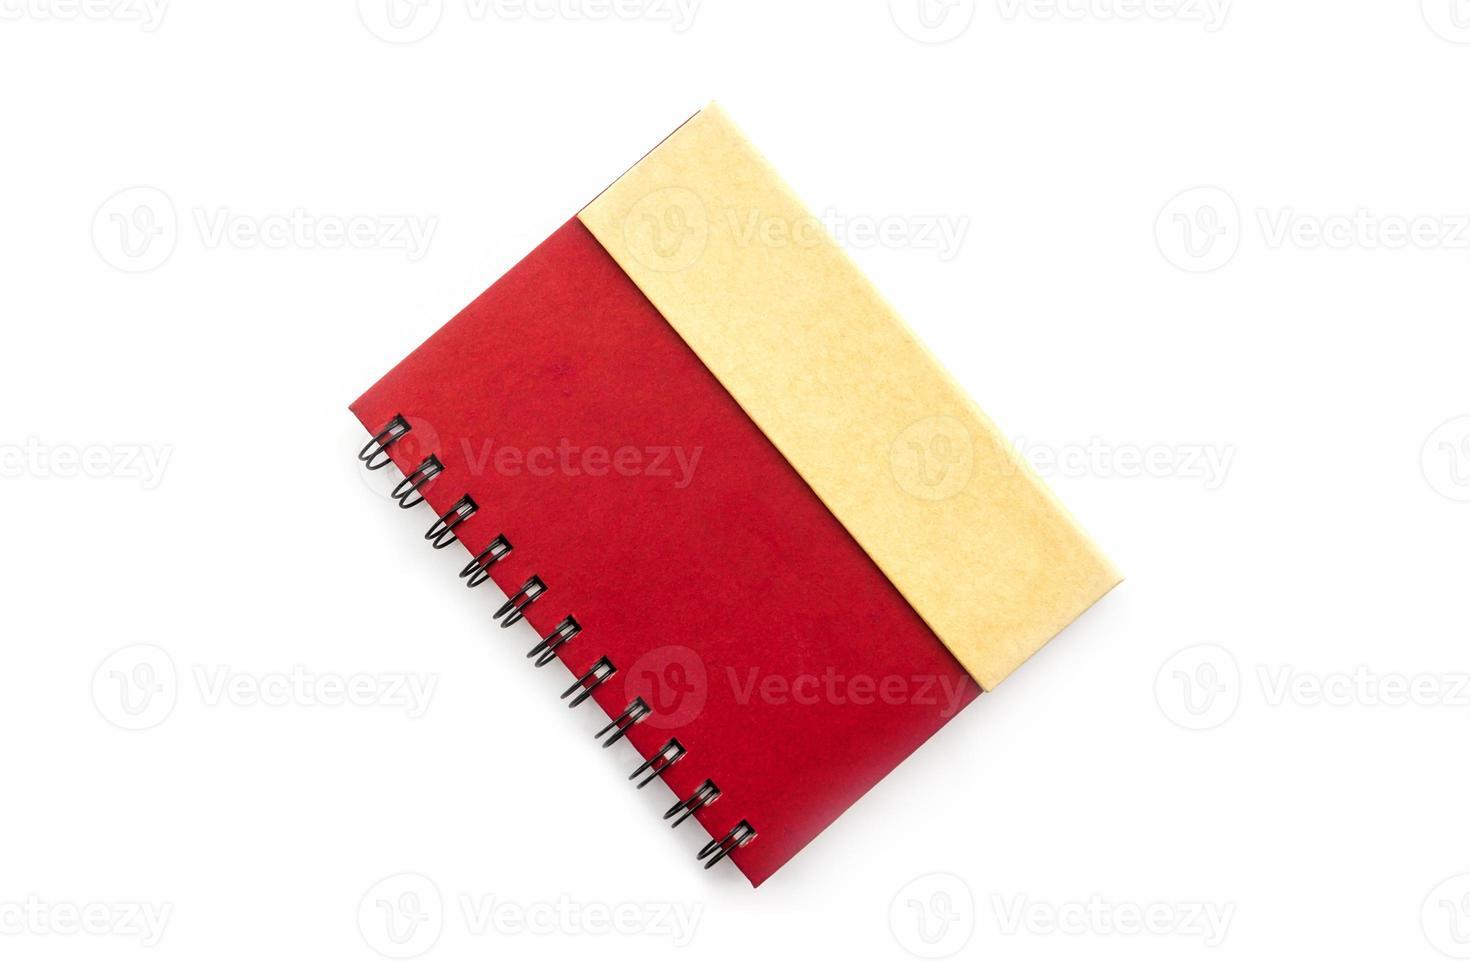 rood dagboekboek op witte achtergrond. foto